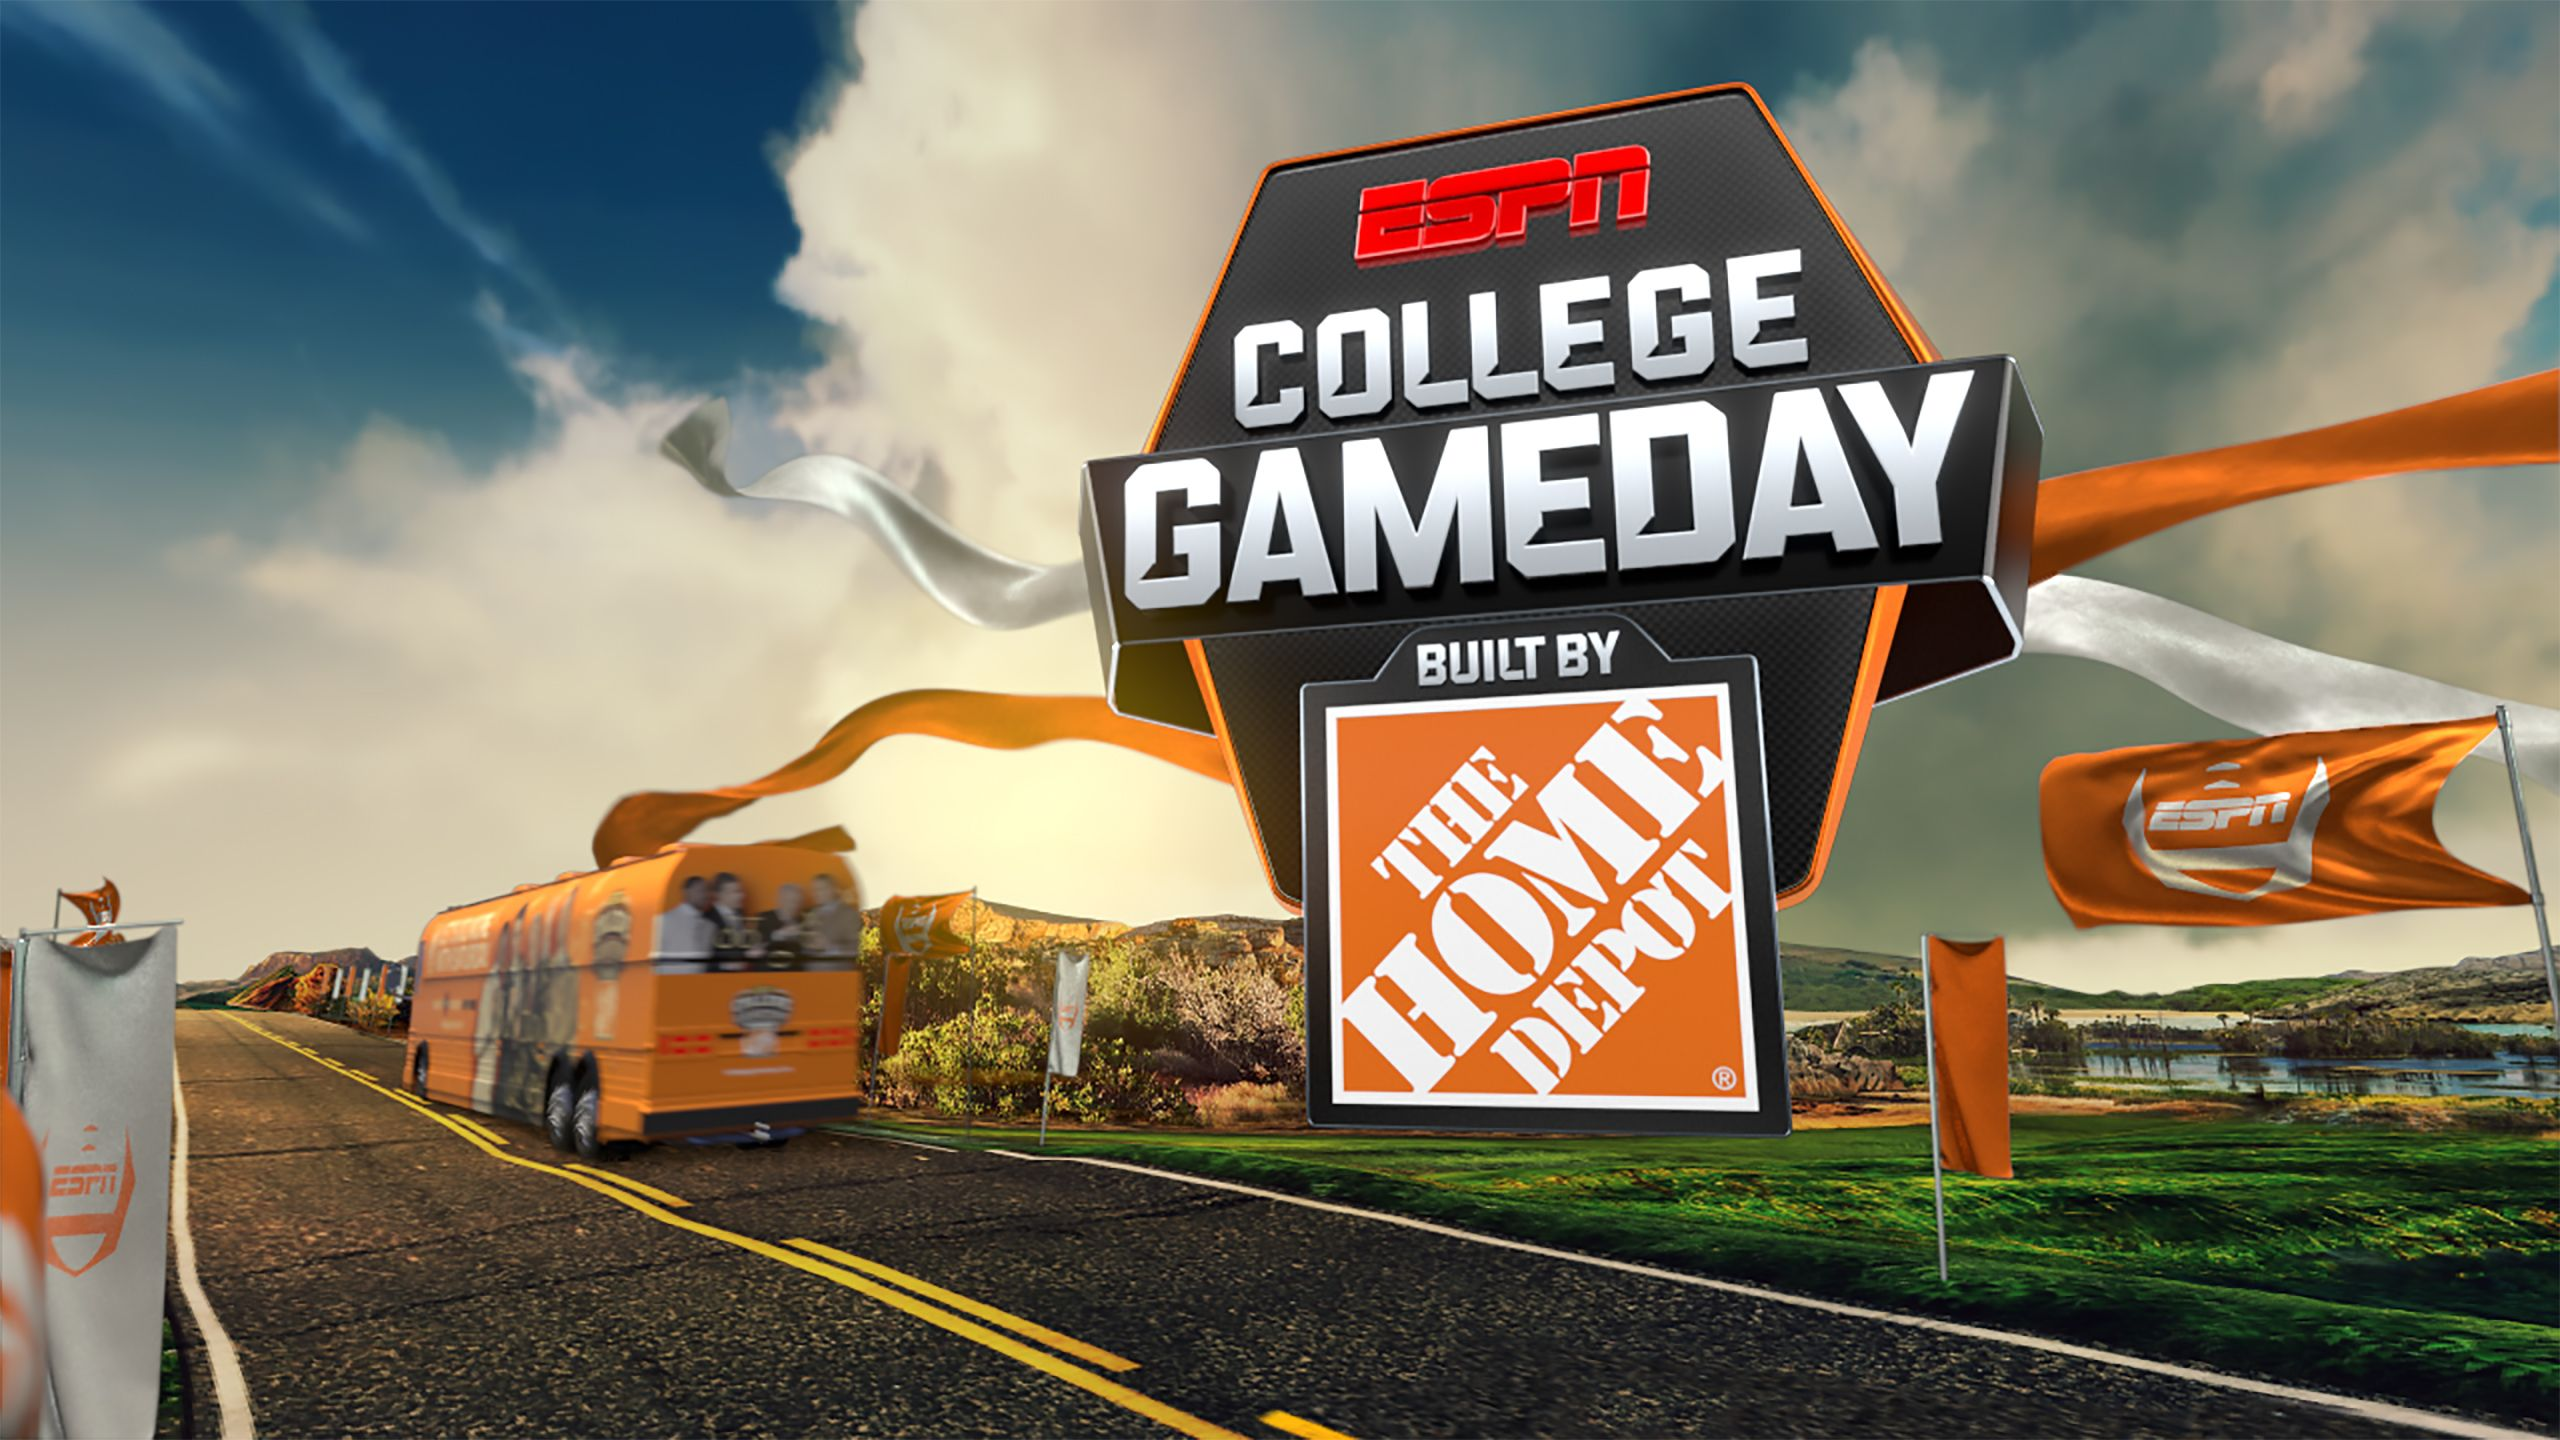 football tomorrow on tv espn 360 college football